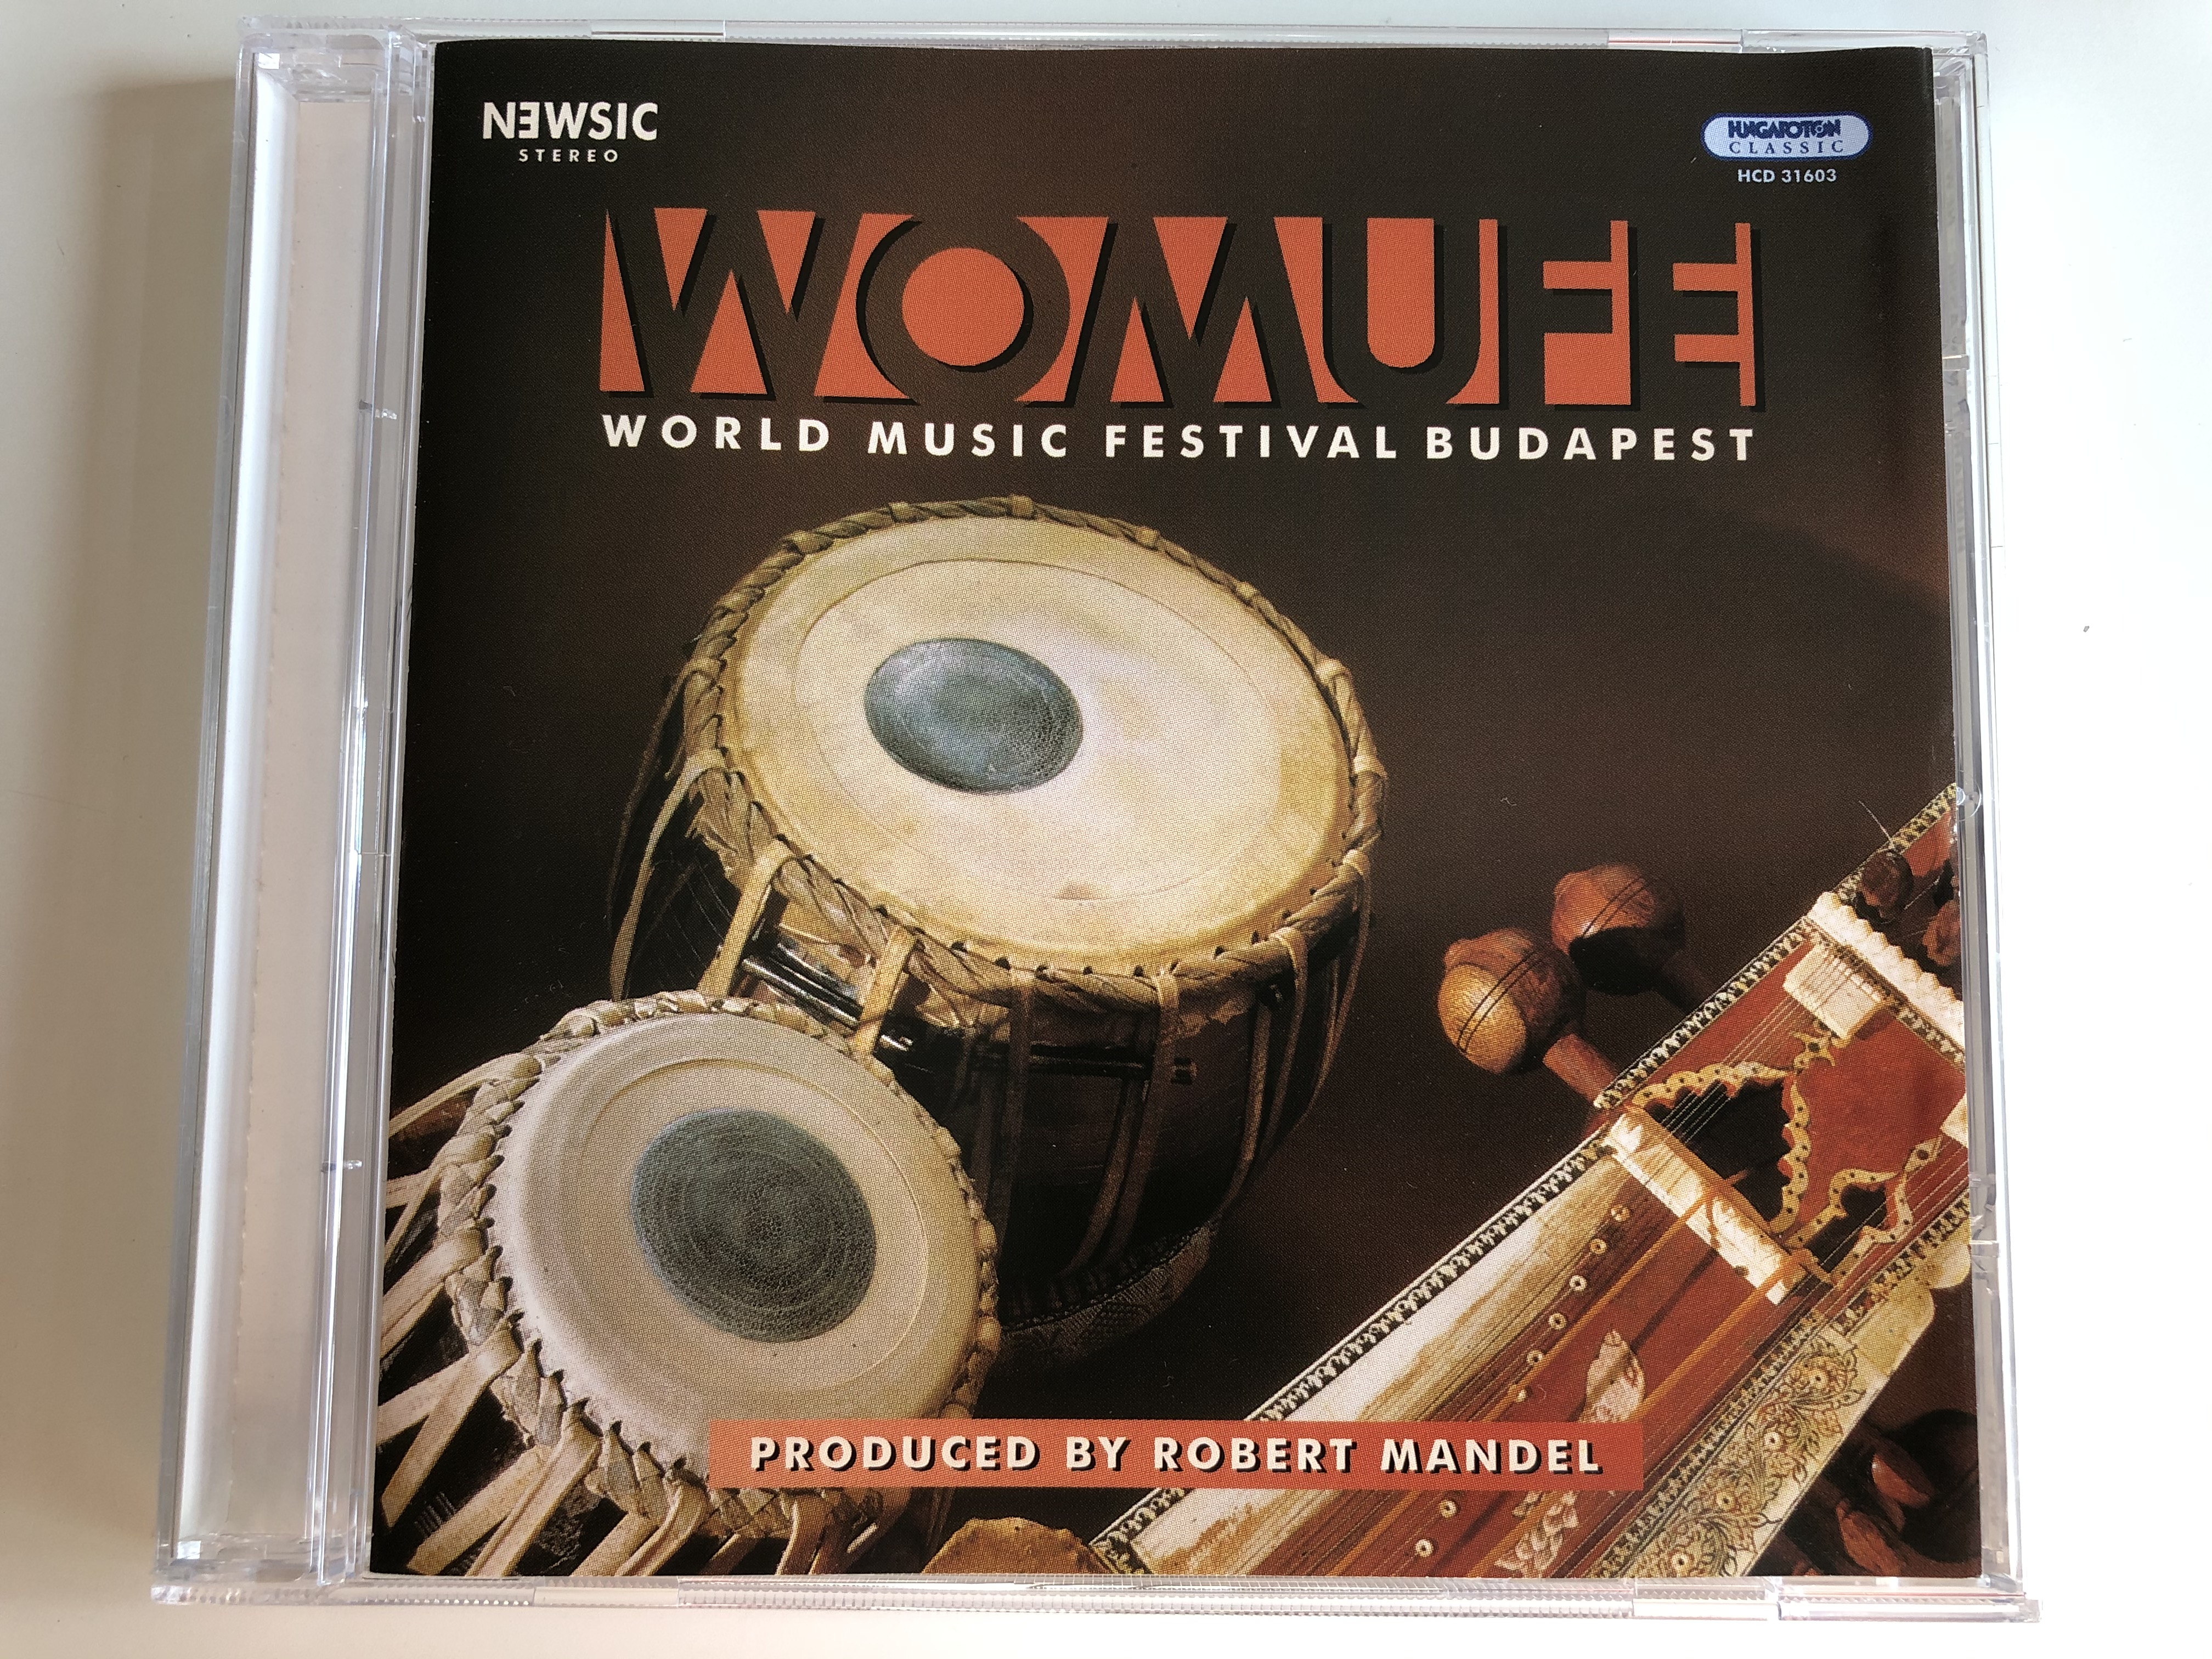 womufe-world-music-festival-budapest-produced-by-robert-mandel-hungaroton-classic-audio-cd-1995-stereo-hcd-31603-1-.jpg